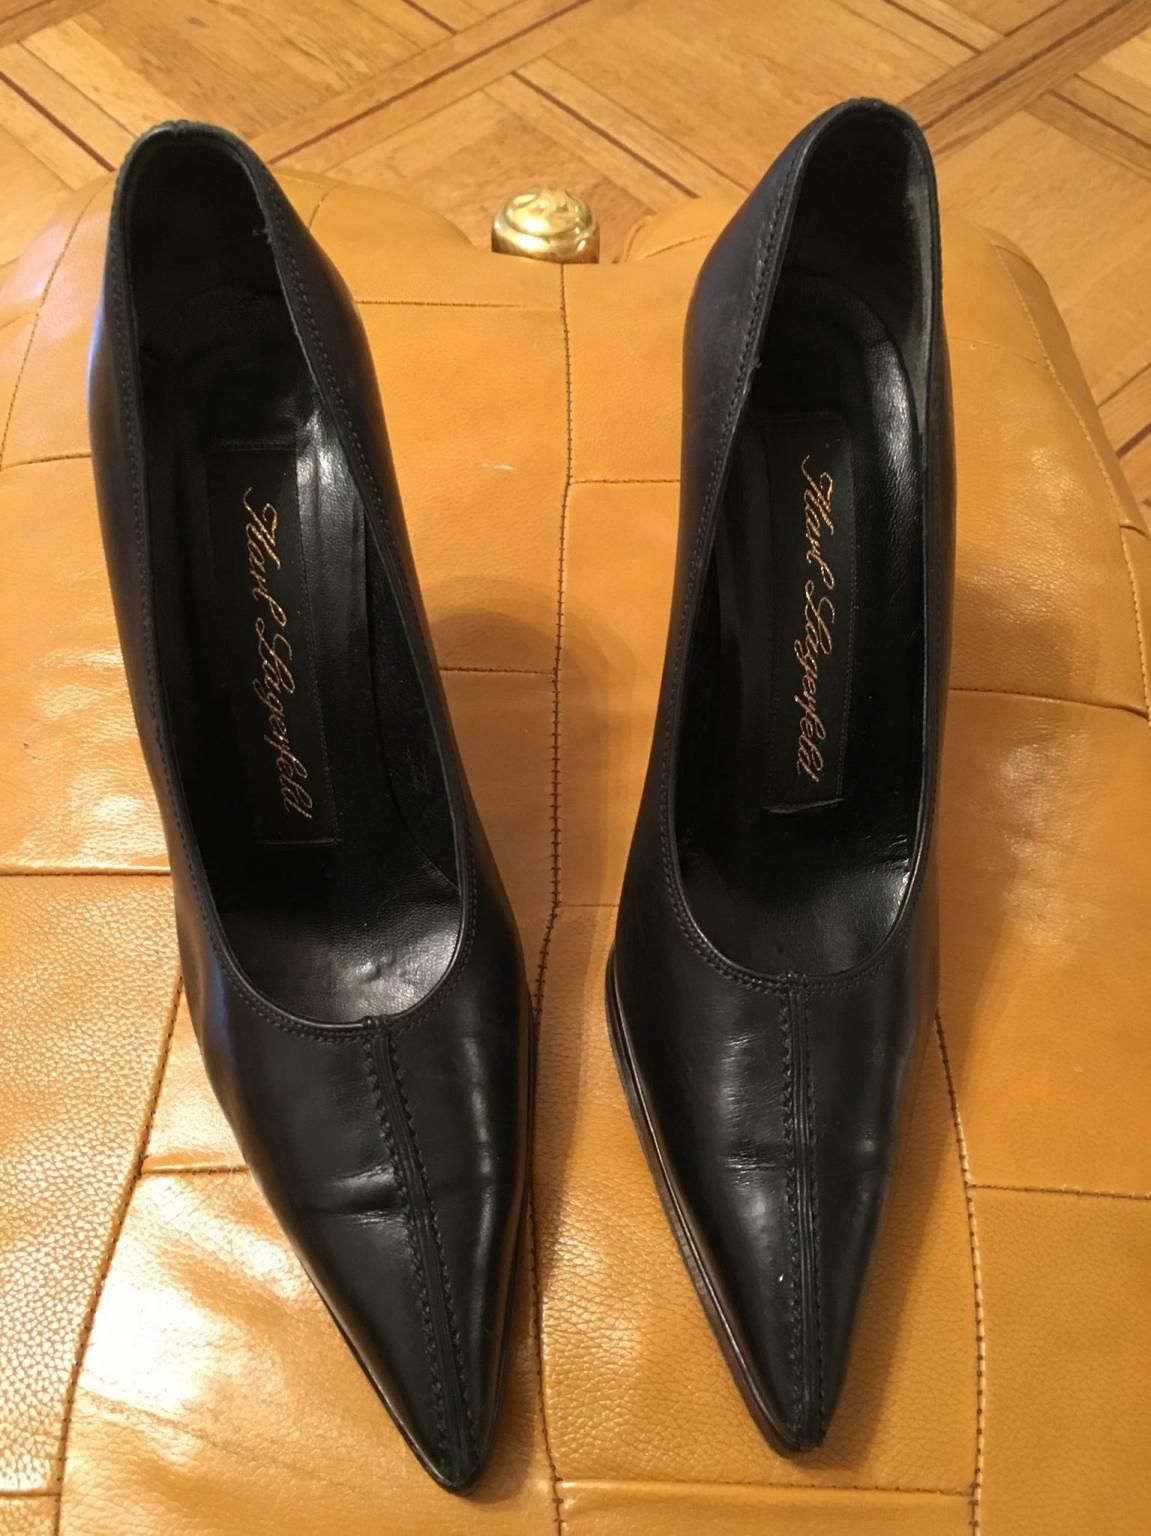 chaussures karl lagerfeld v tements accessoires. Black Bedroom Furniture Sets. Home Design Ideas